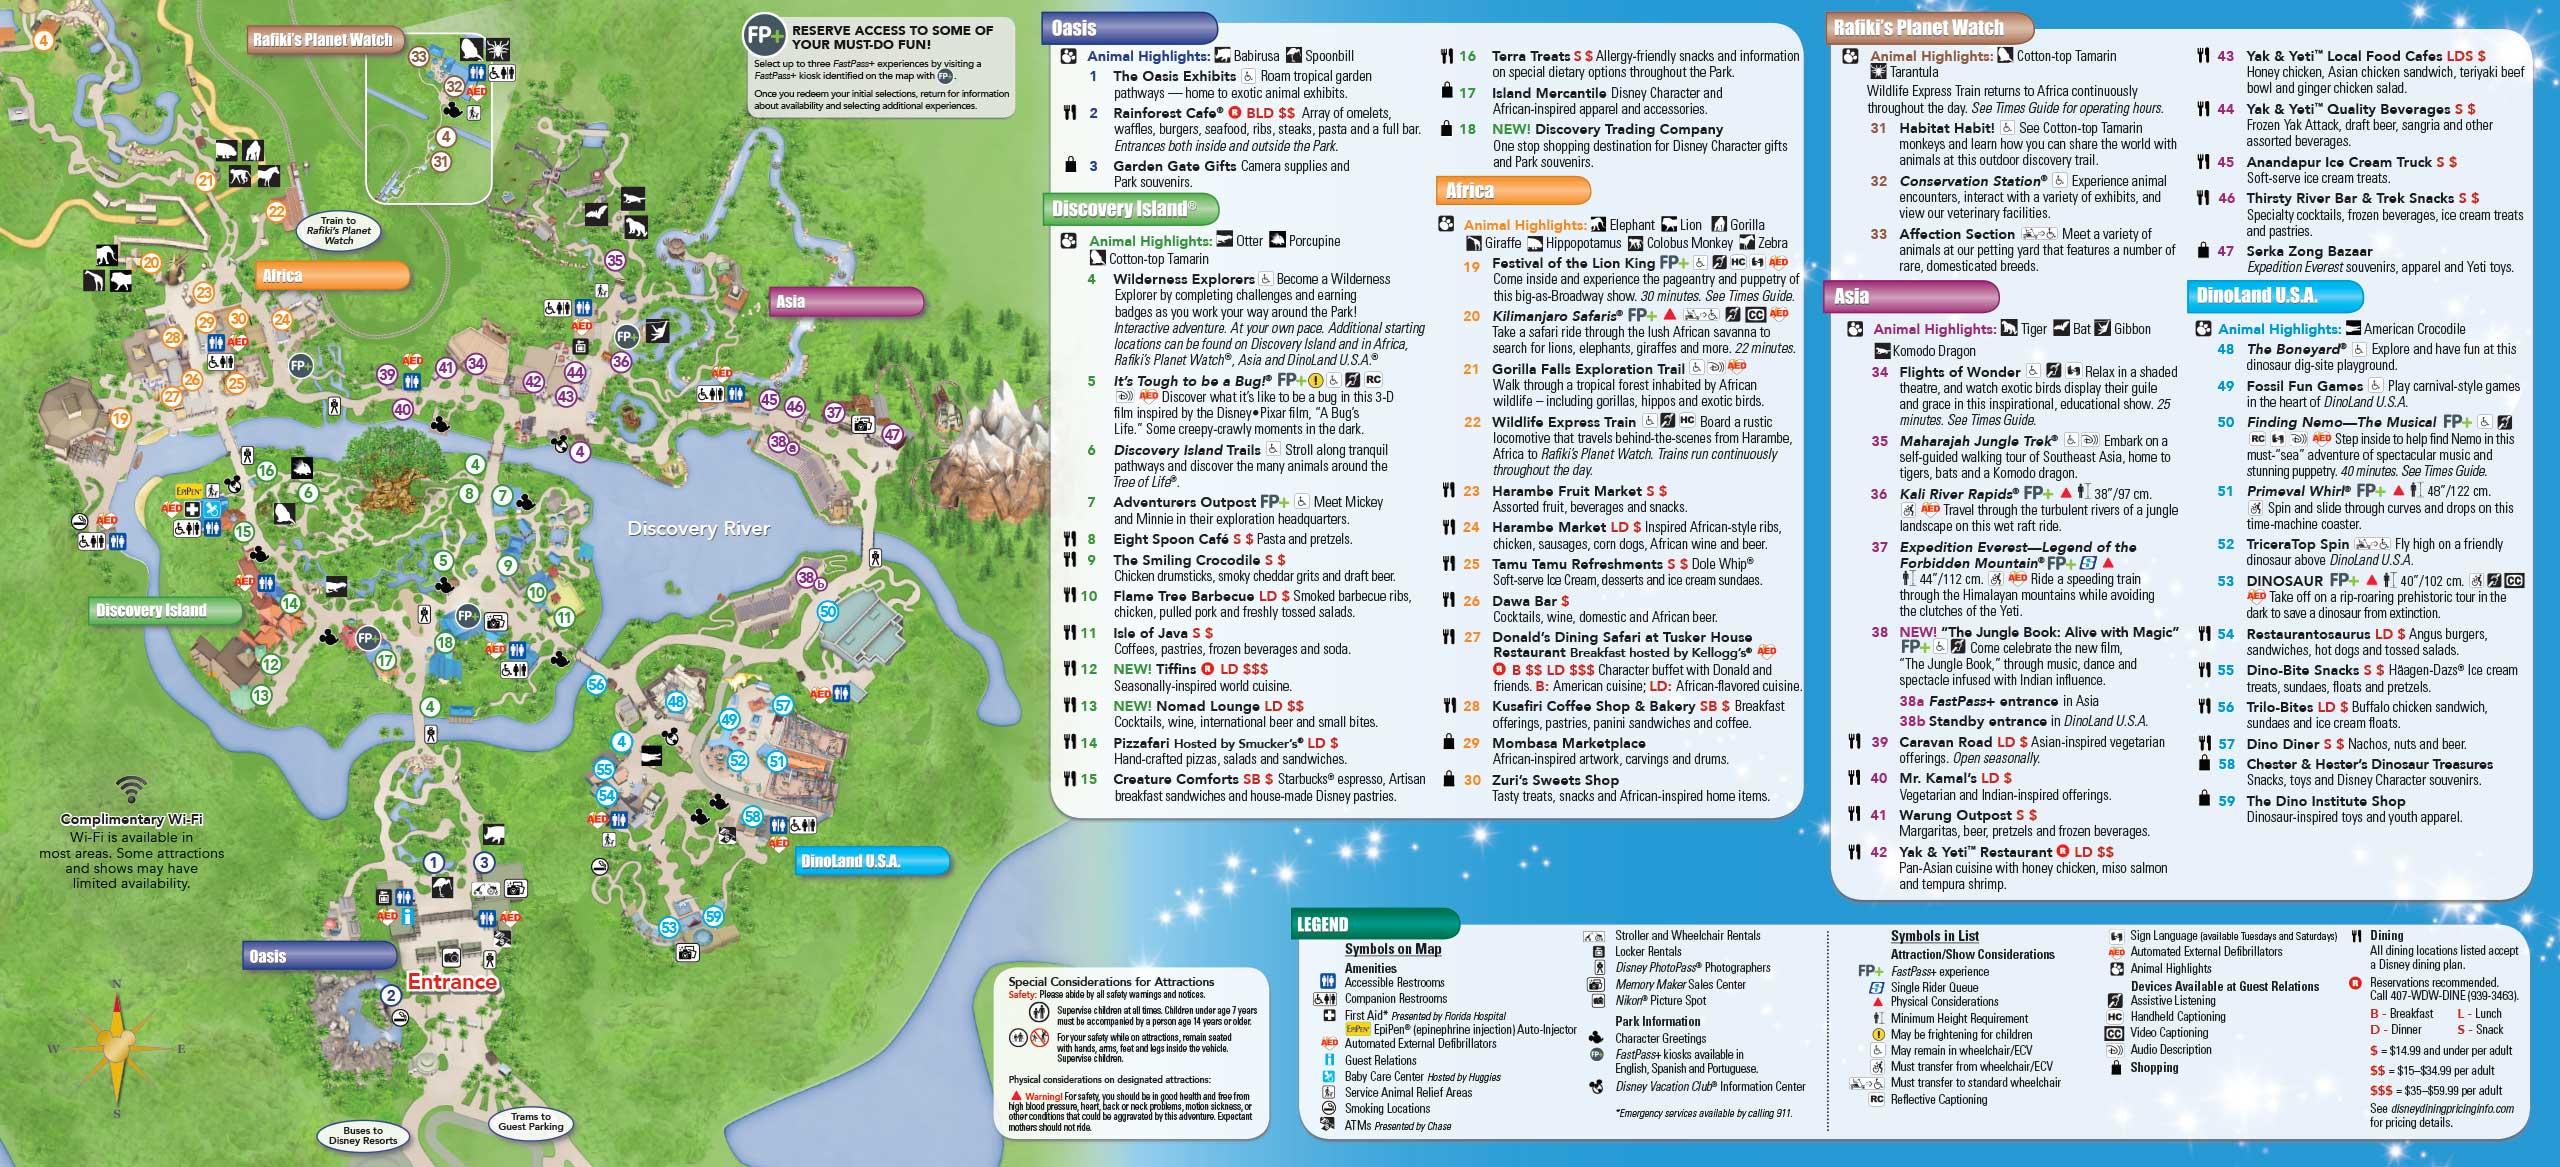 may 2016 walt disney world park maps photo 1 of 14